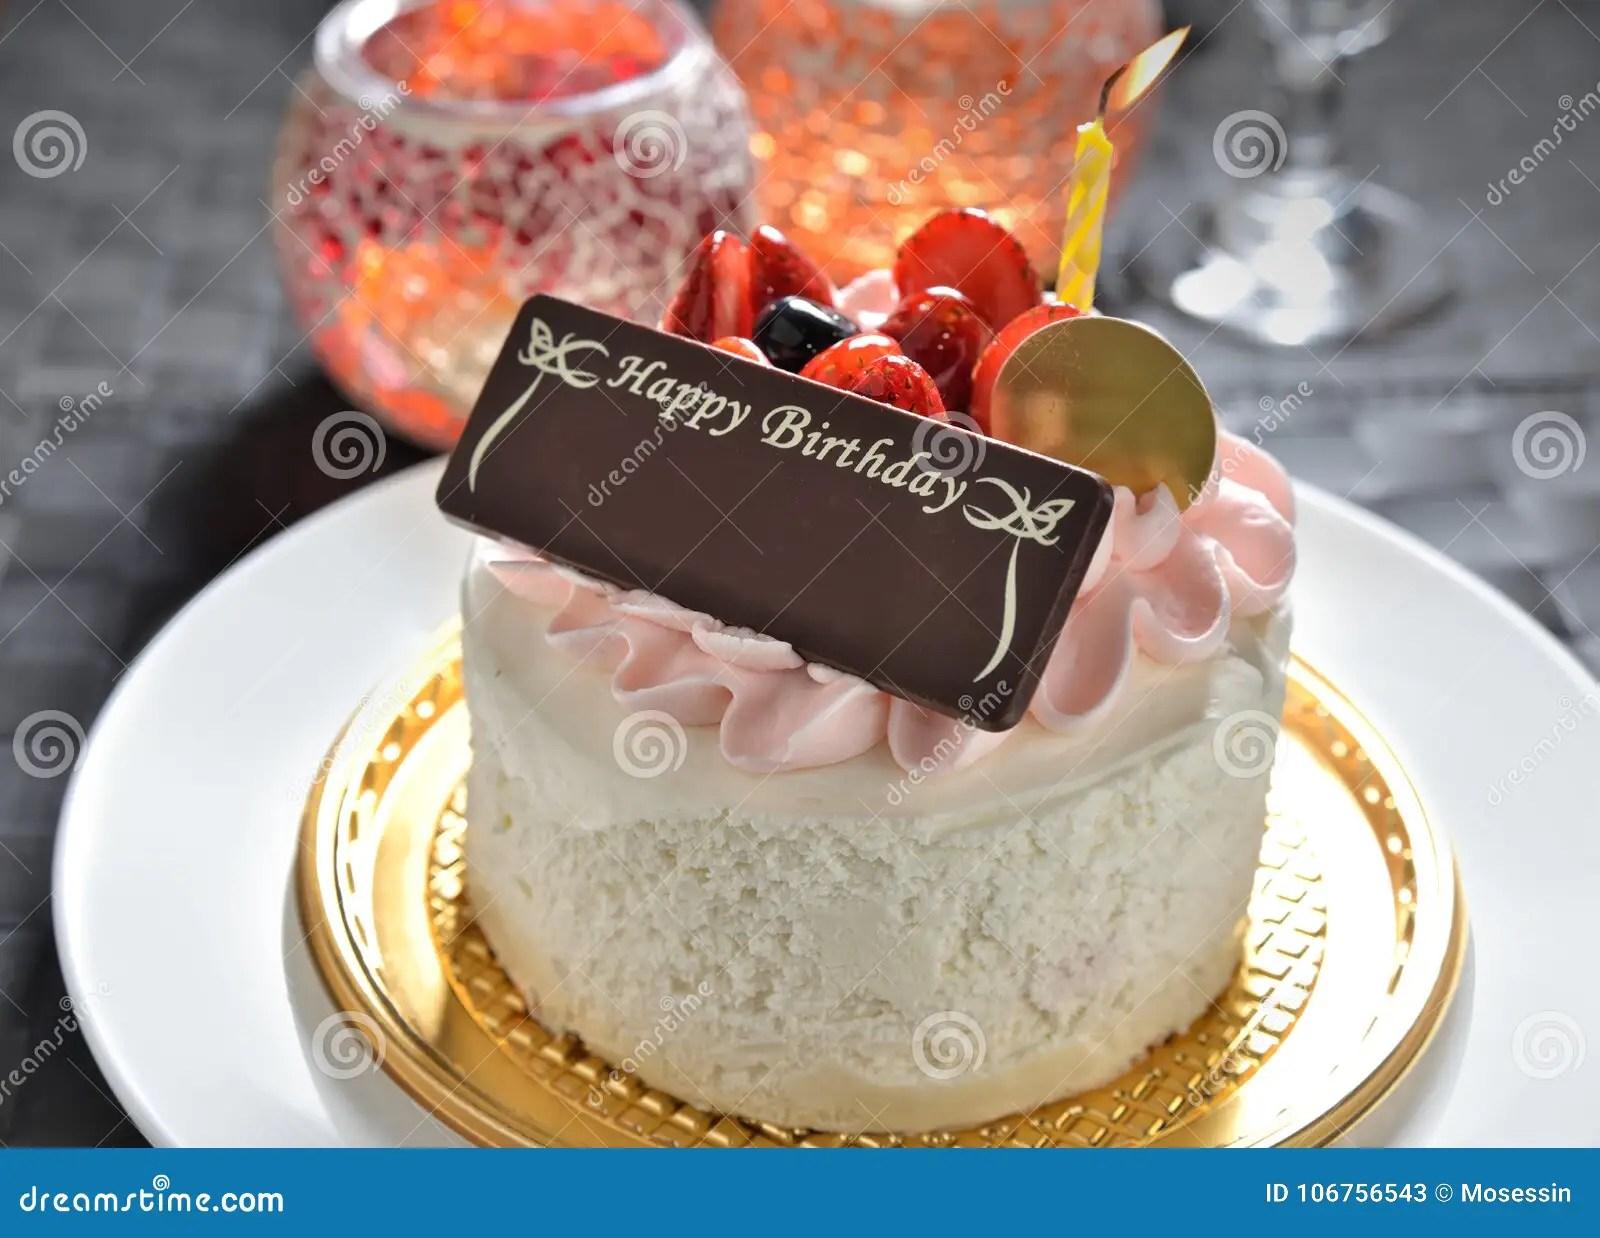 Birthday Cake With Name Tag Stock Image Image Of Creamy